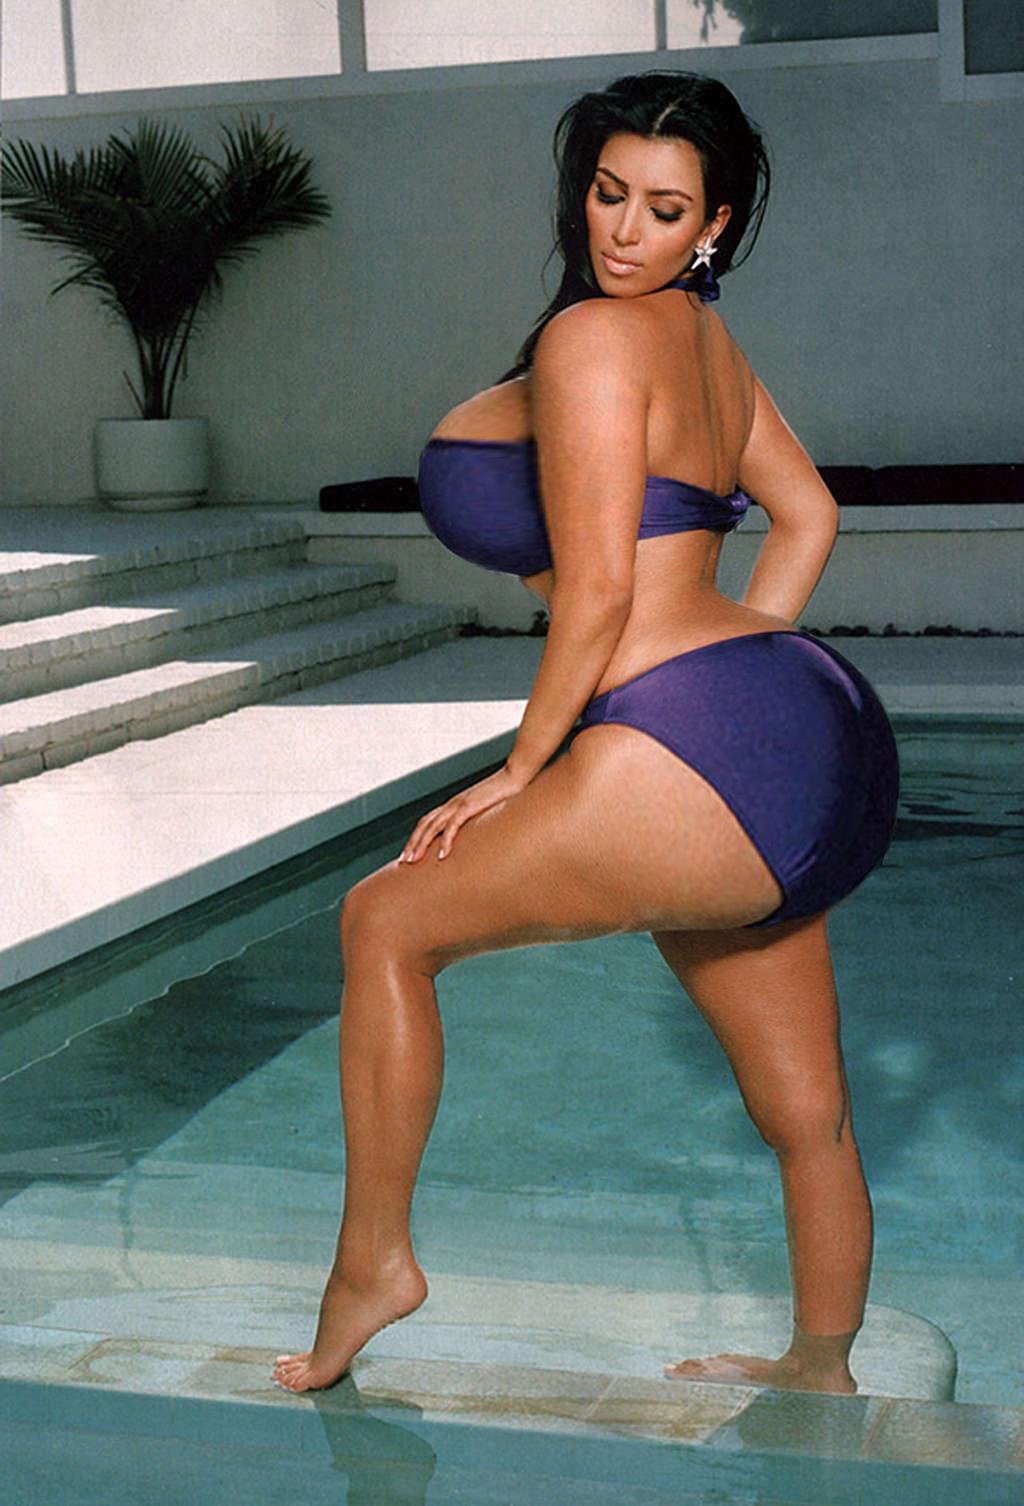 Kim_Kardashian-kim-kardashian-05-3 copy